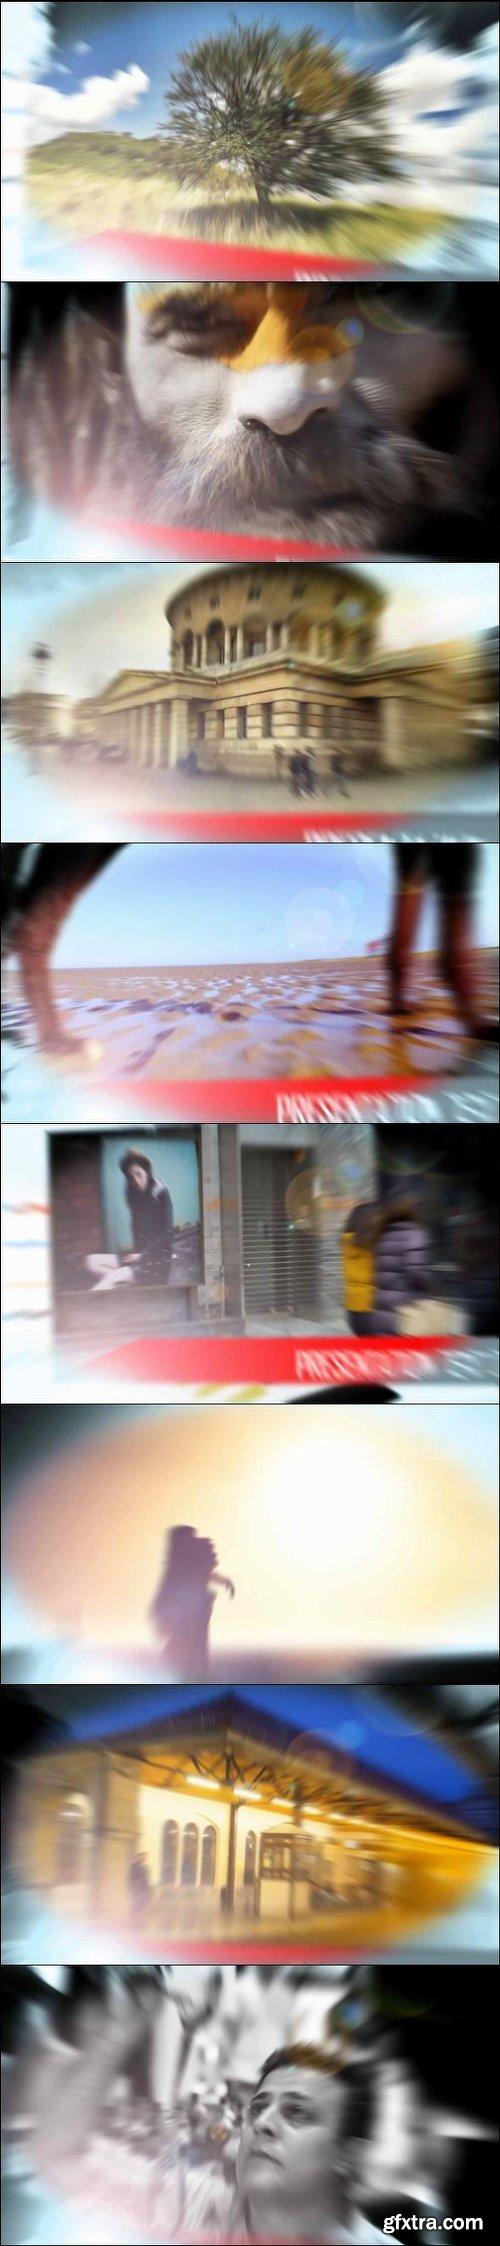 Zooming Through Slideshow